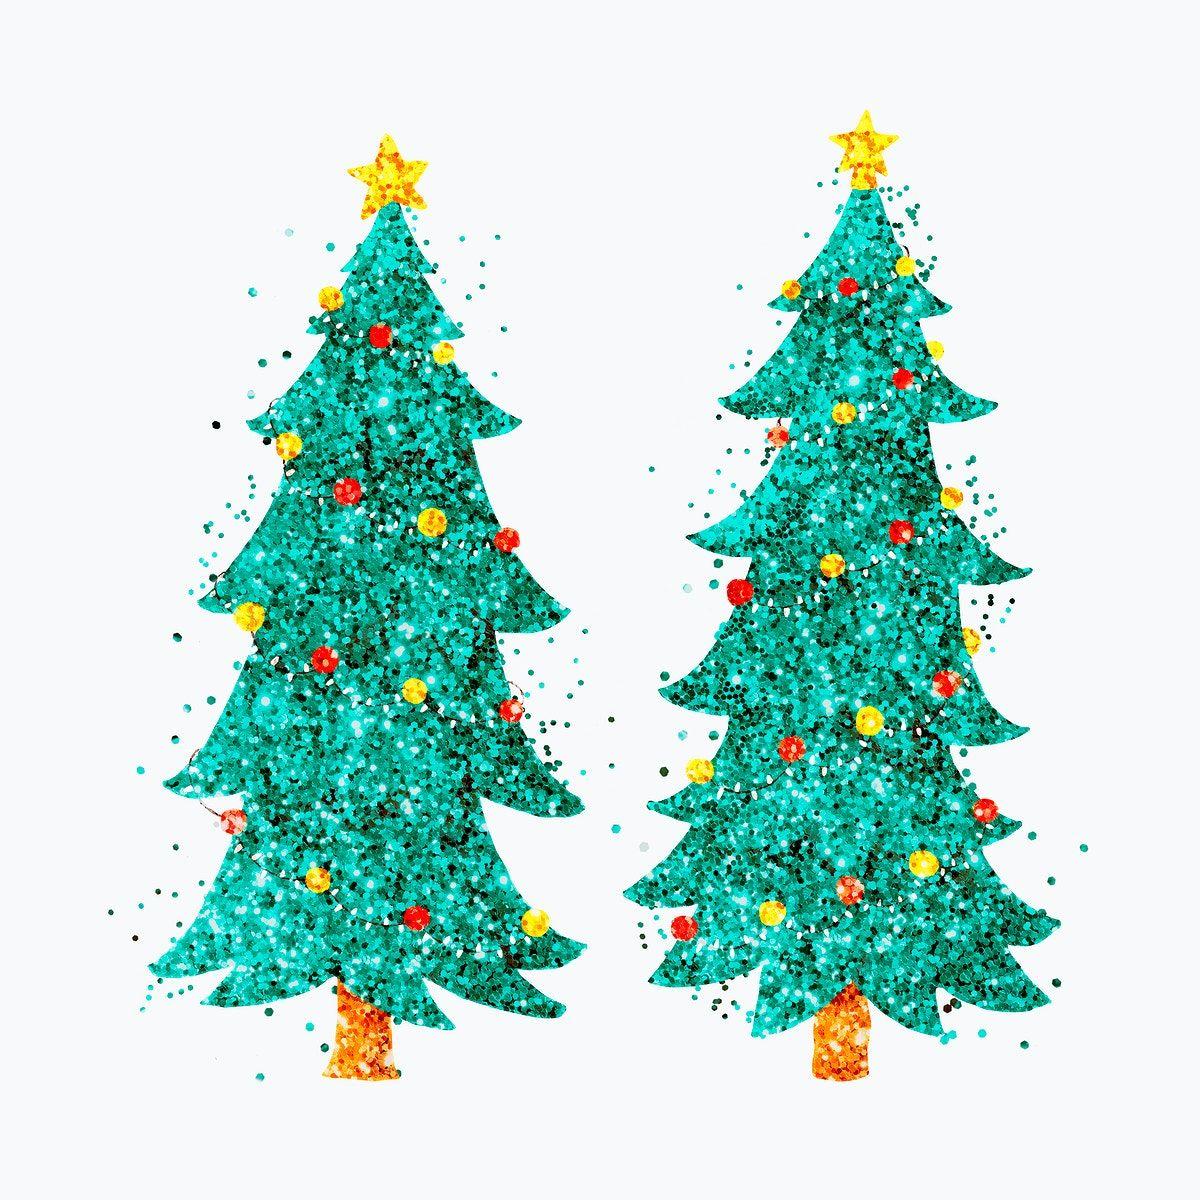 Glitter Green Christmas Tree Psd Hand Drawn Set Free Image By Rawpixel Com Jingpixar In 2020 Green Christmas Tree Green Christmas Drawing Set